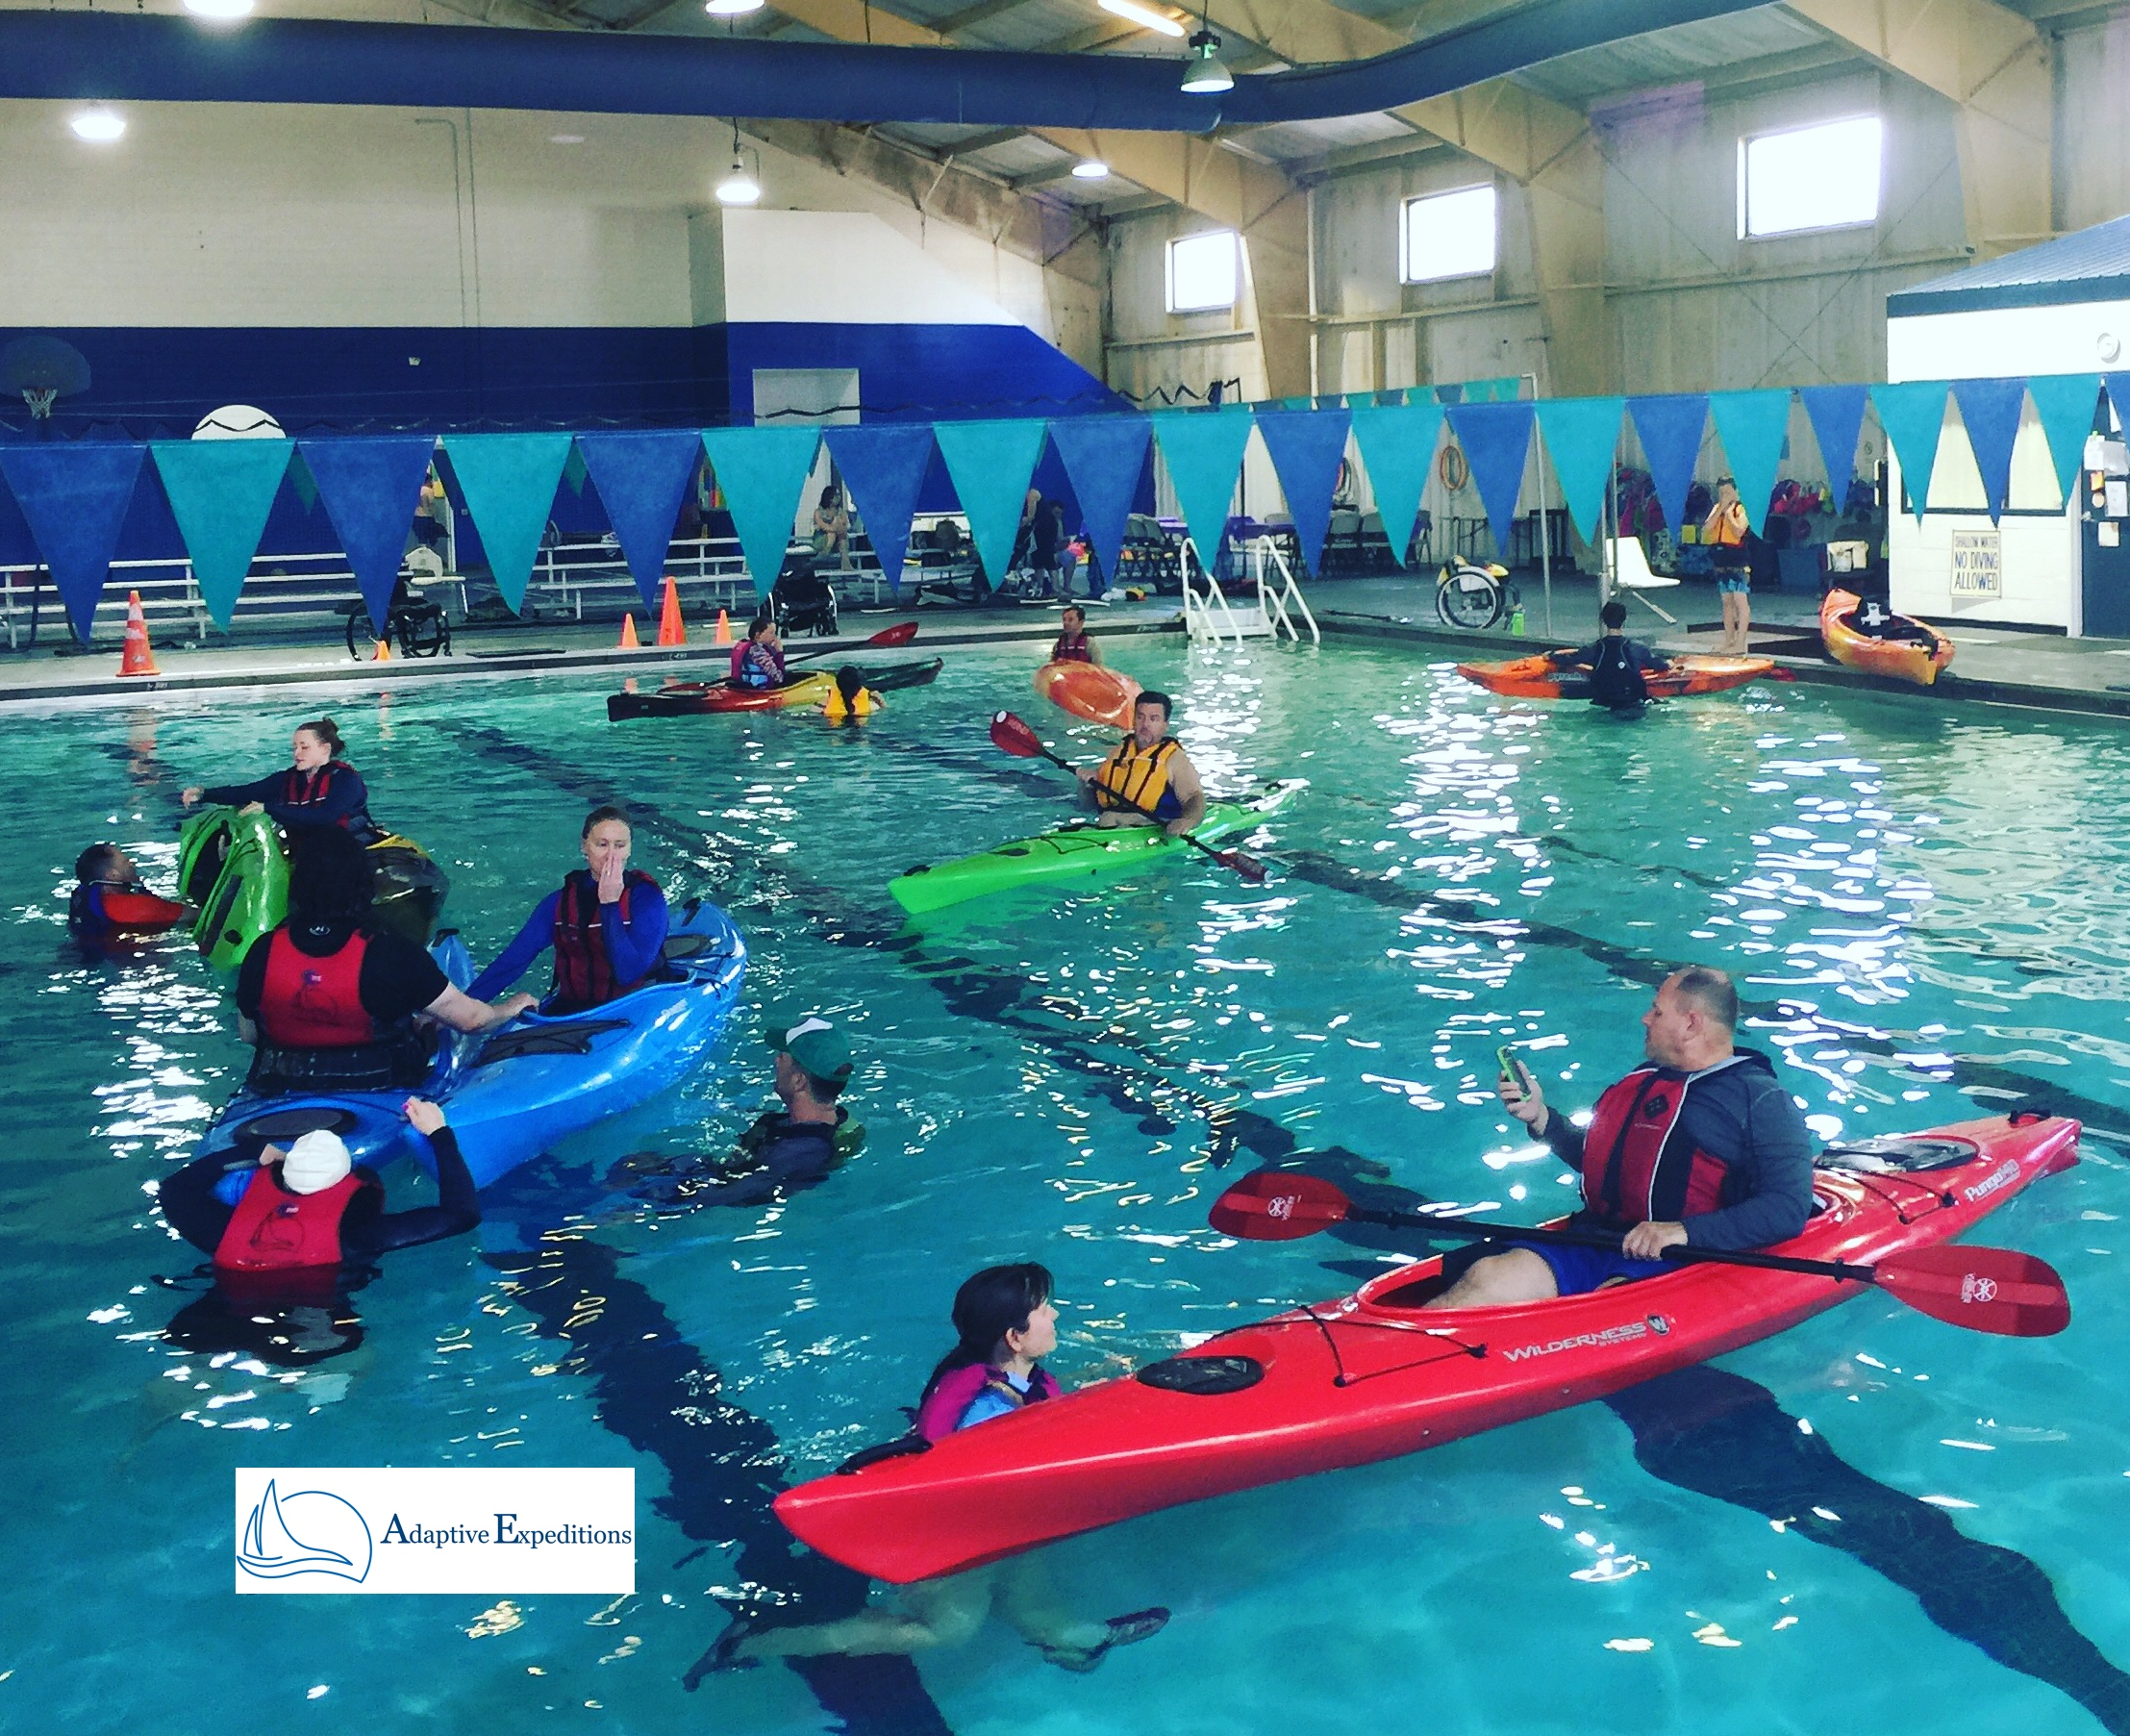 Photo of adaptive paddle sport kayak pool session.